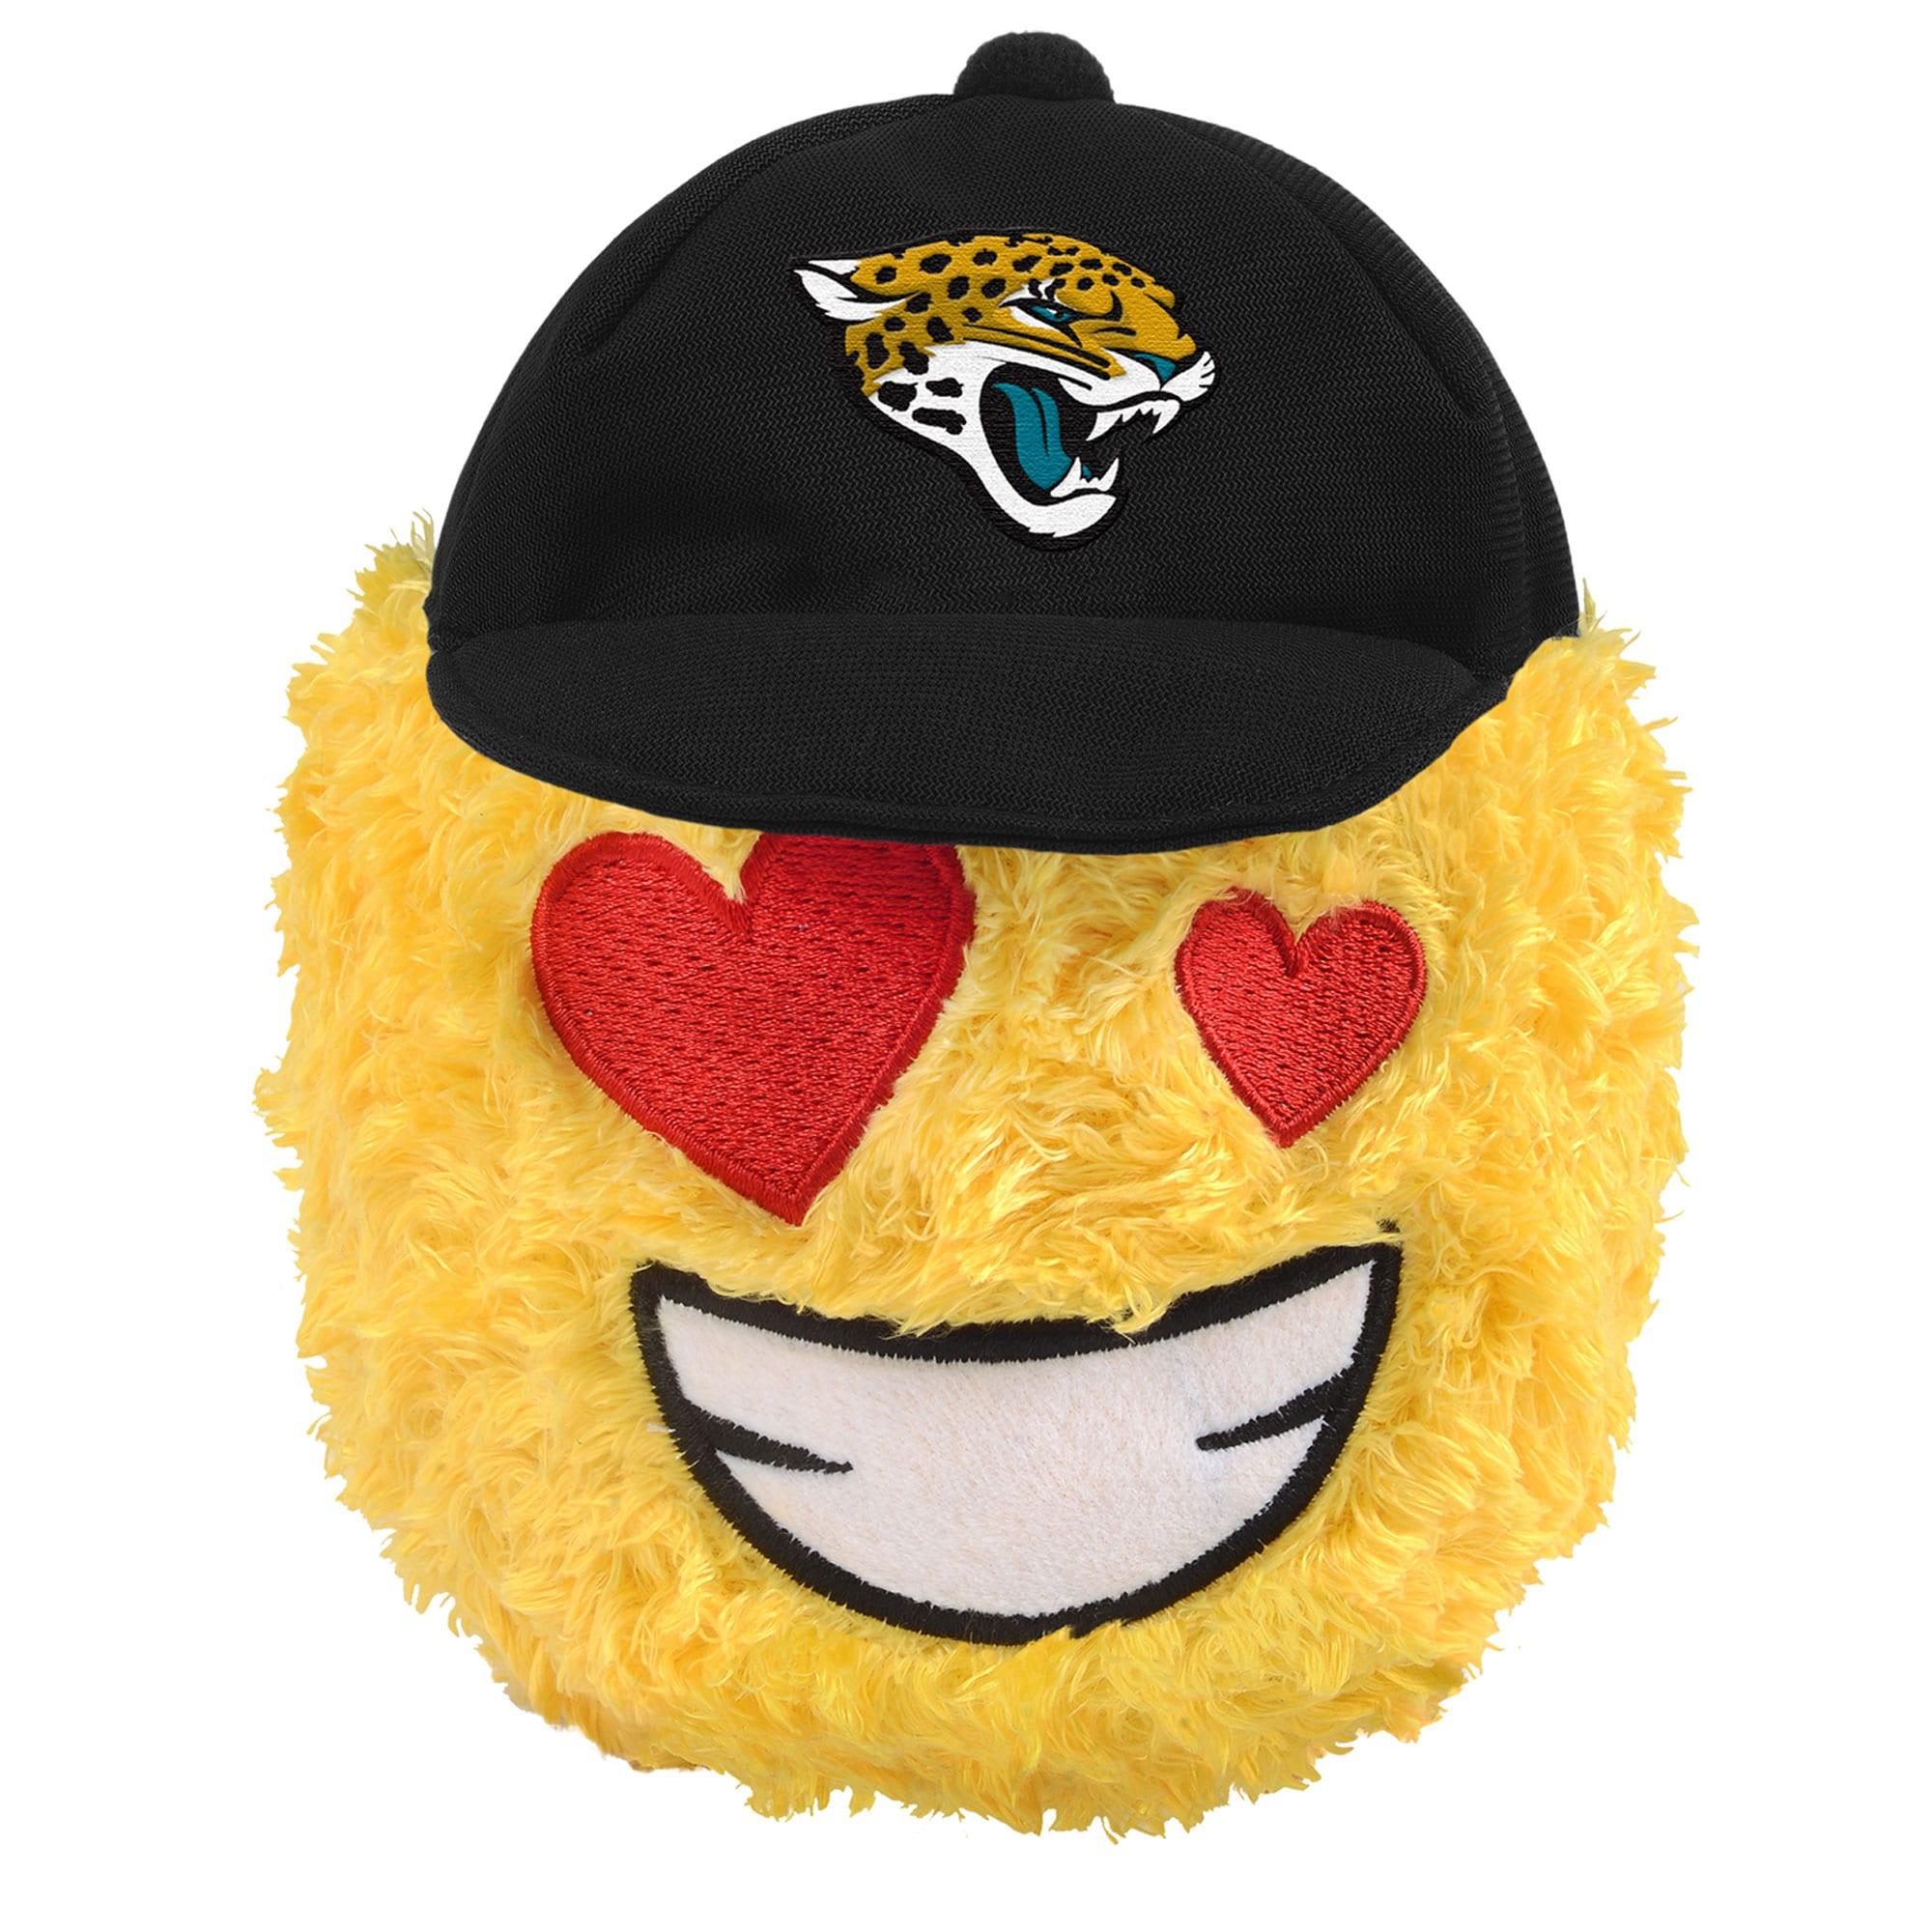 "Jacksonville Jaguars 5"" Heart Eyes Teamoji Plush Toy"